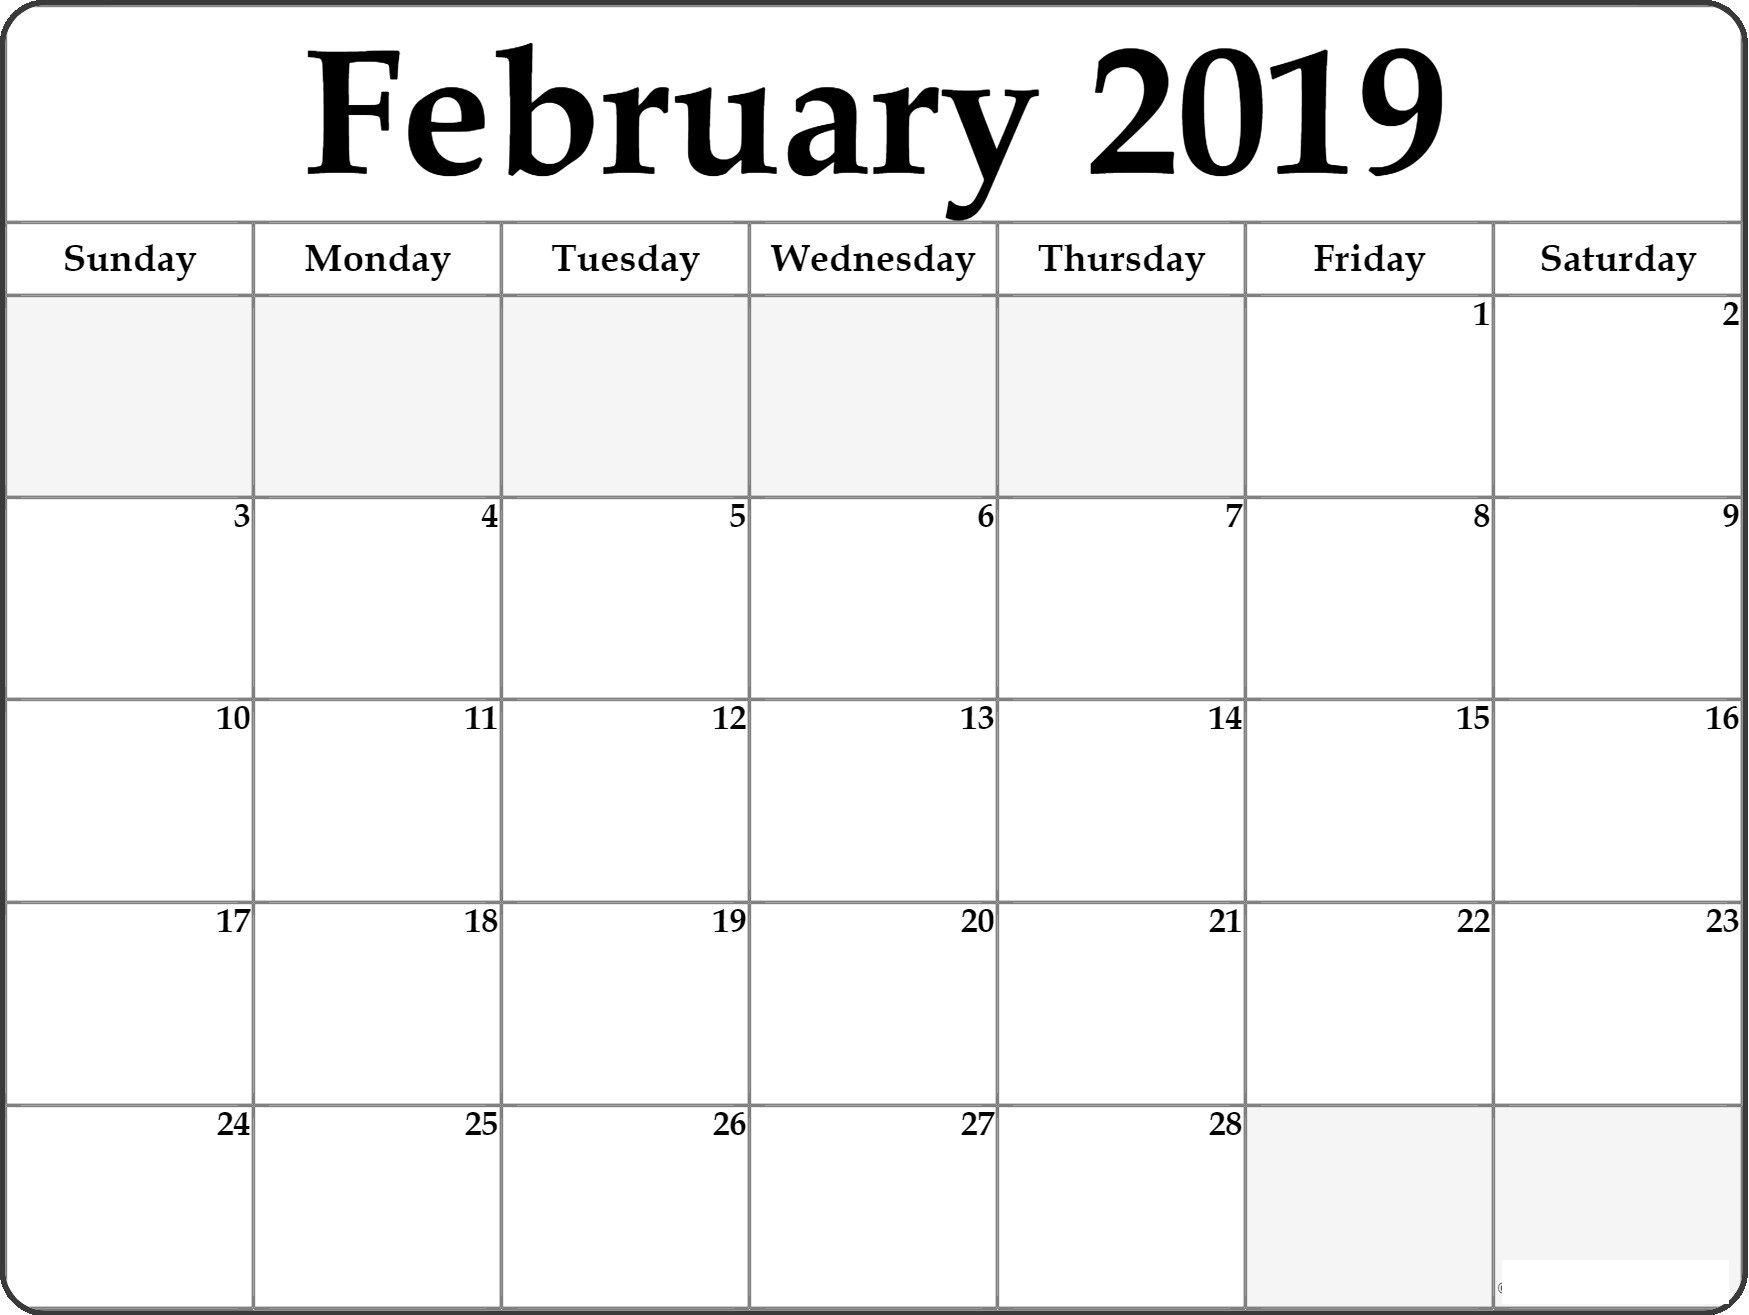 Work Calendar 2019 February calendar 2019 Manage Work | February Calendar 2019 Manage